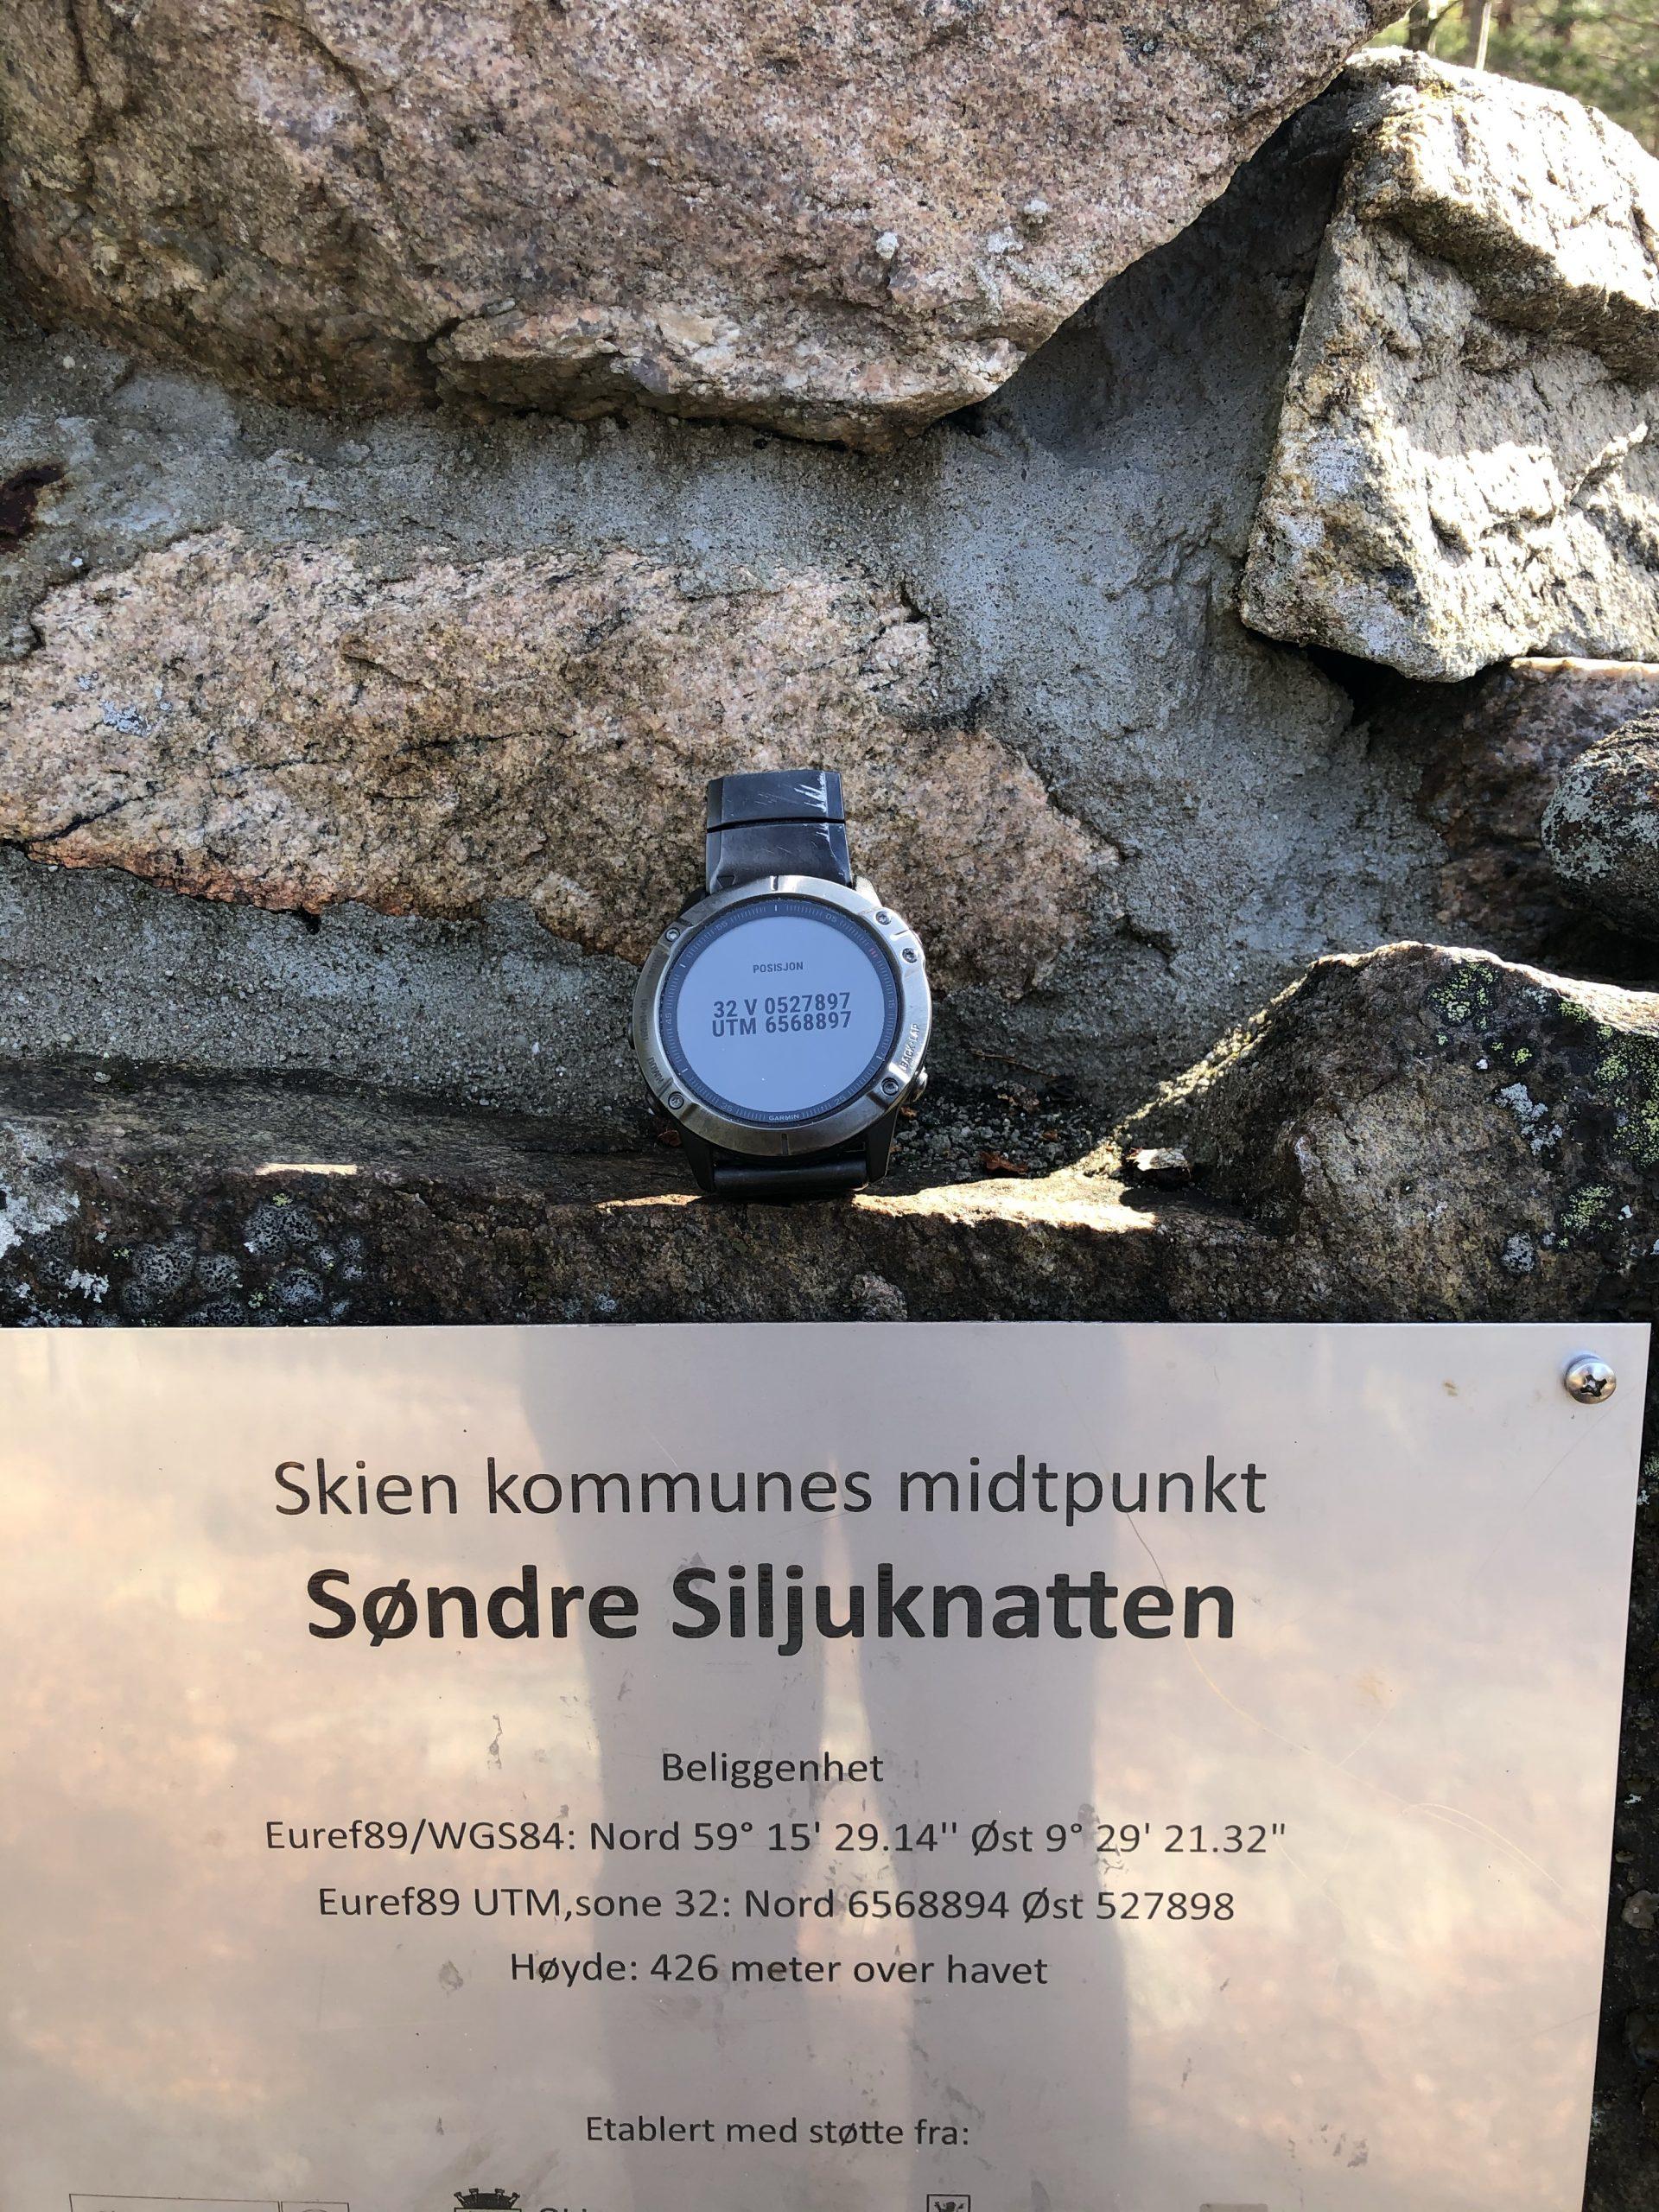 Ulvskollen via Kremmeren, Siljuknatten og Magnetkollen.